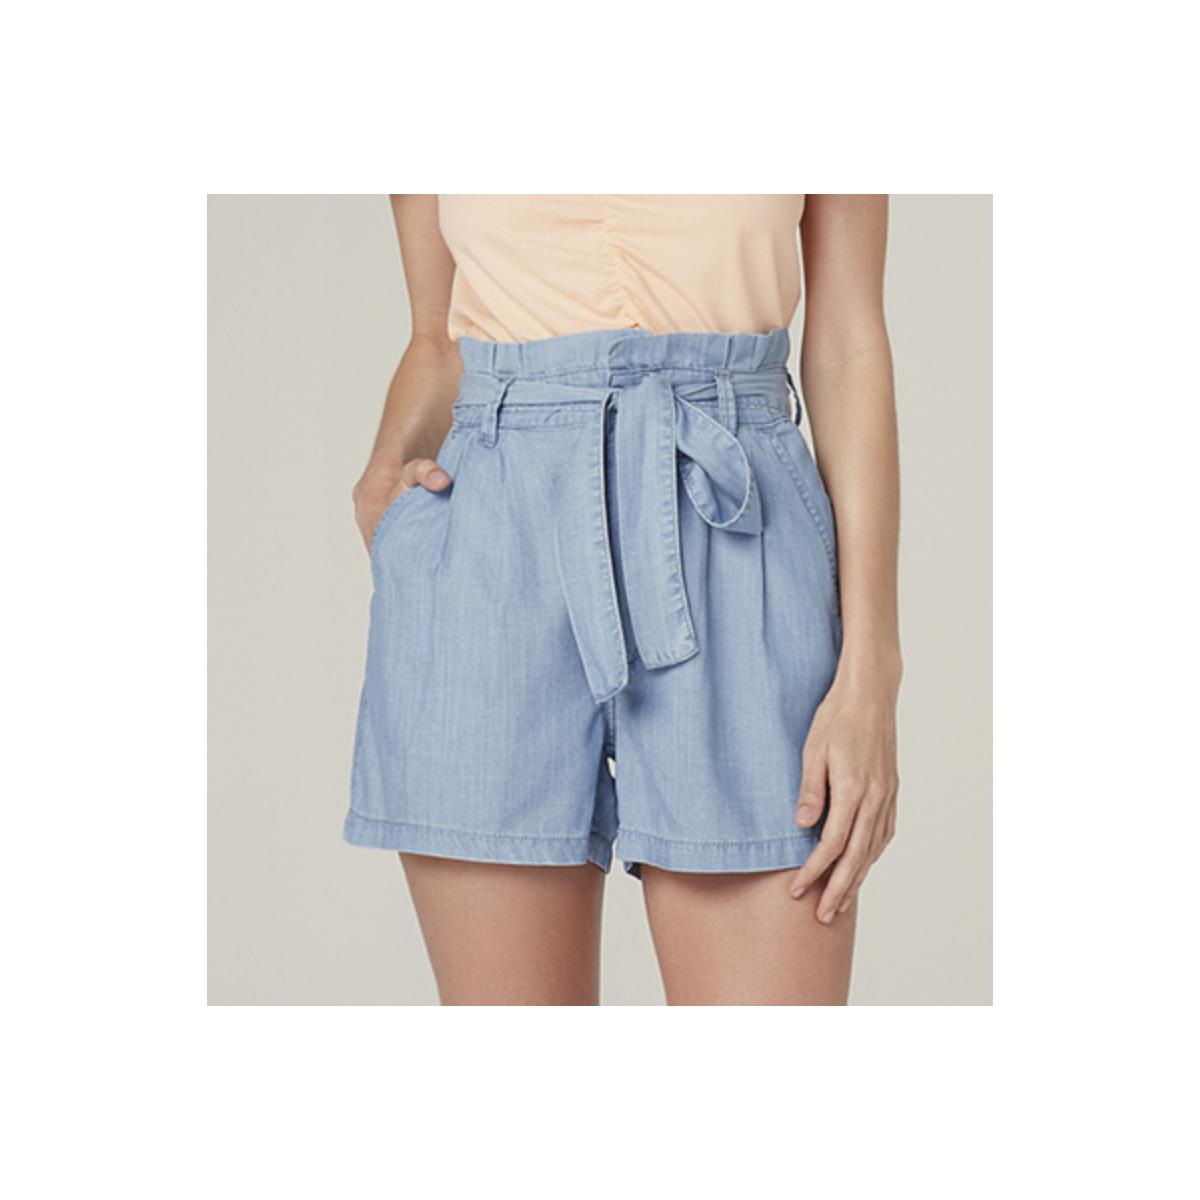 Short Feminino Dzarm Zc4c 1bsn Jeans Claro